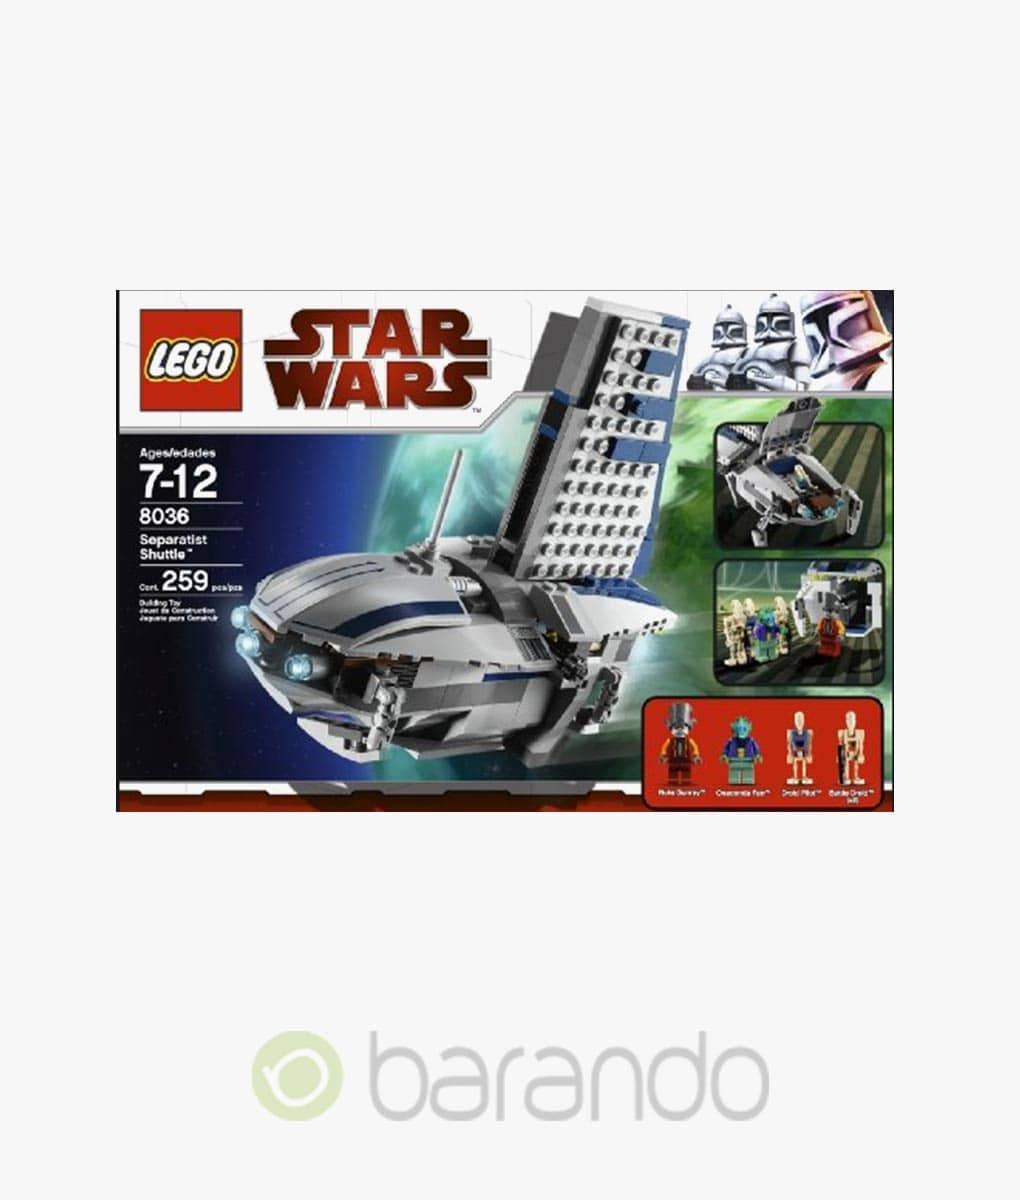 LEGO Star Wars 8036 Separatist Shuttle Set